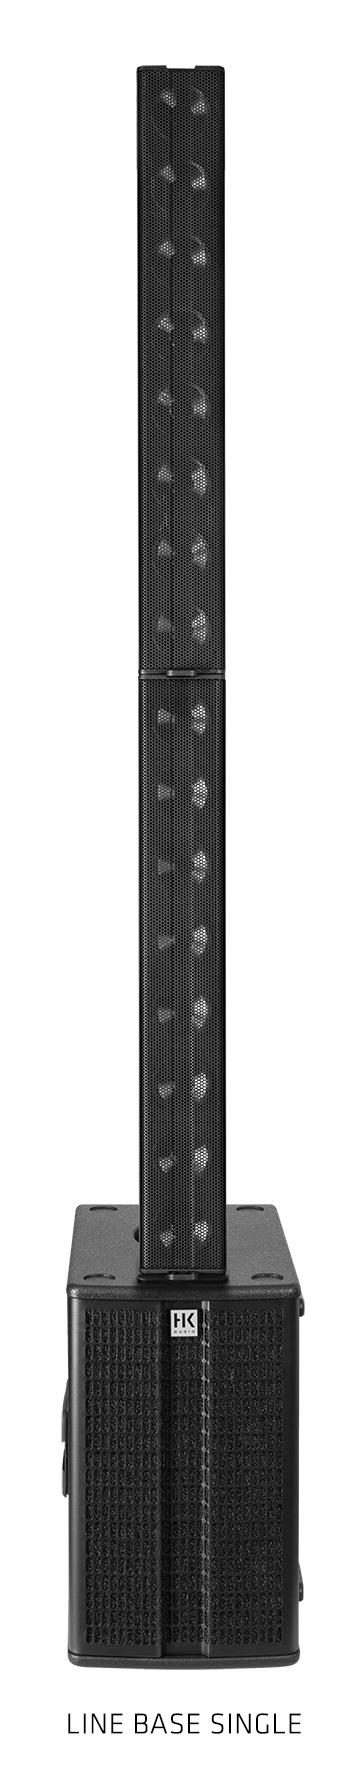 HK Audio ELEMENTS - Line Base Single